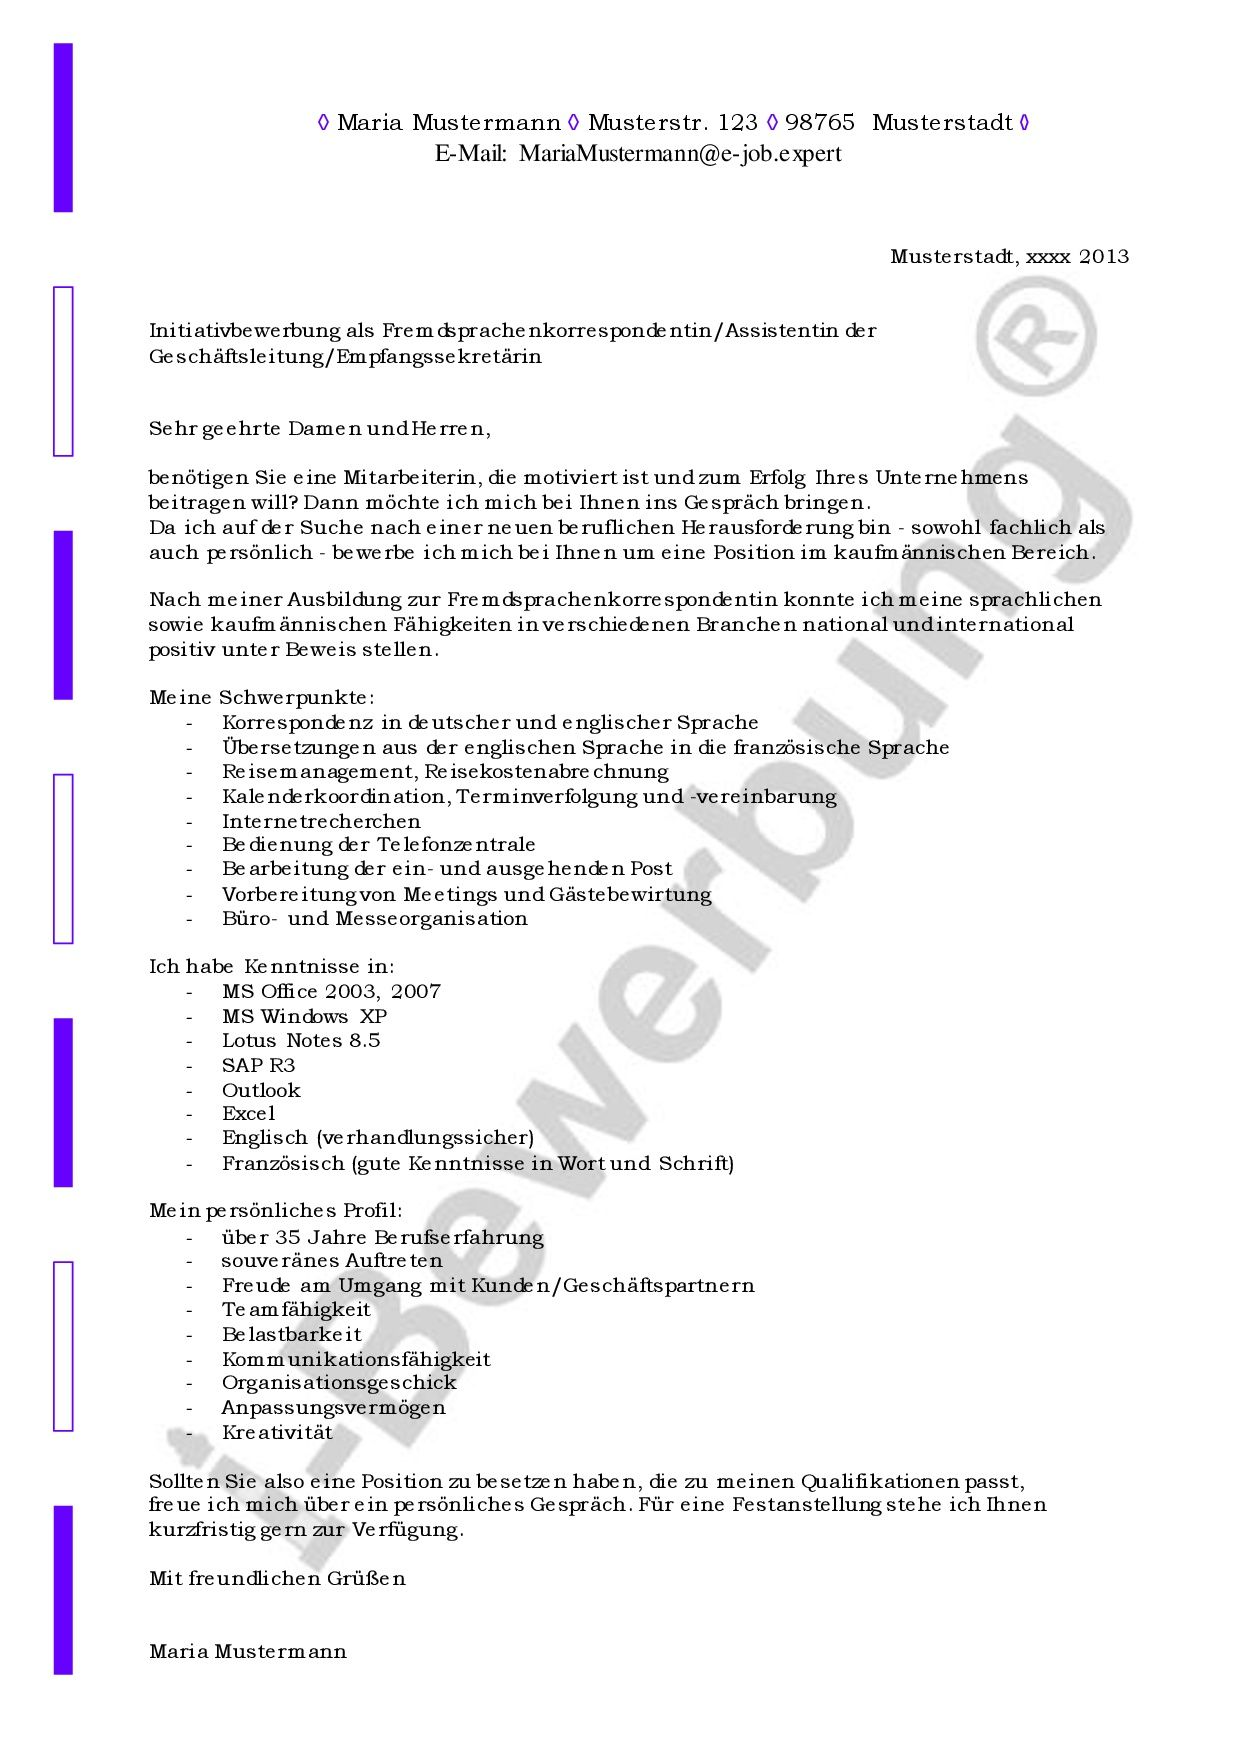 musteranschreiben zur i bewerbung als empfangssekretrin - Welche Schriftgrose Bei Bewerbungen